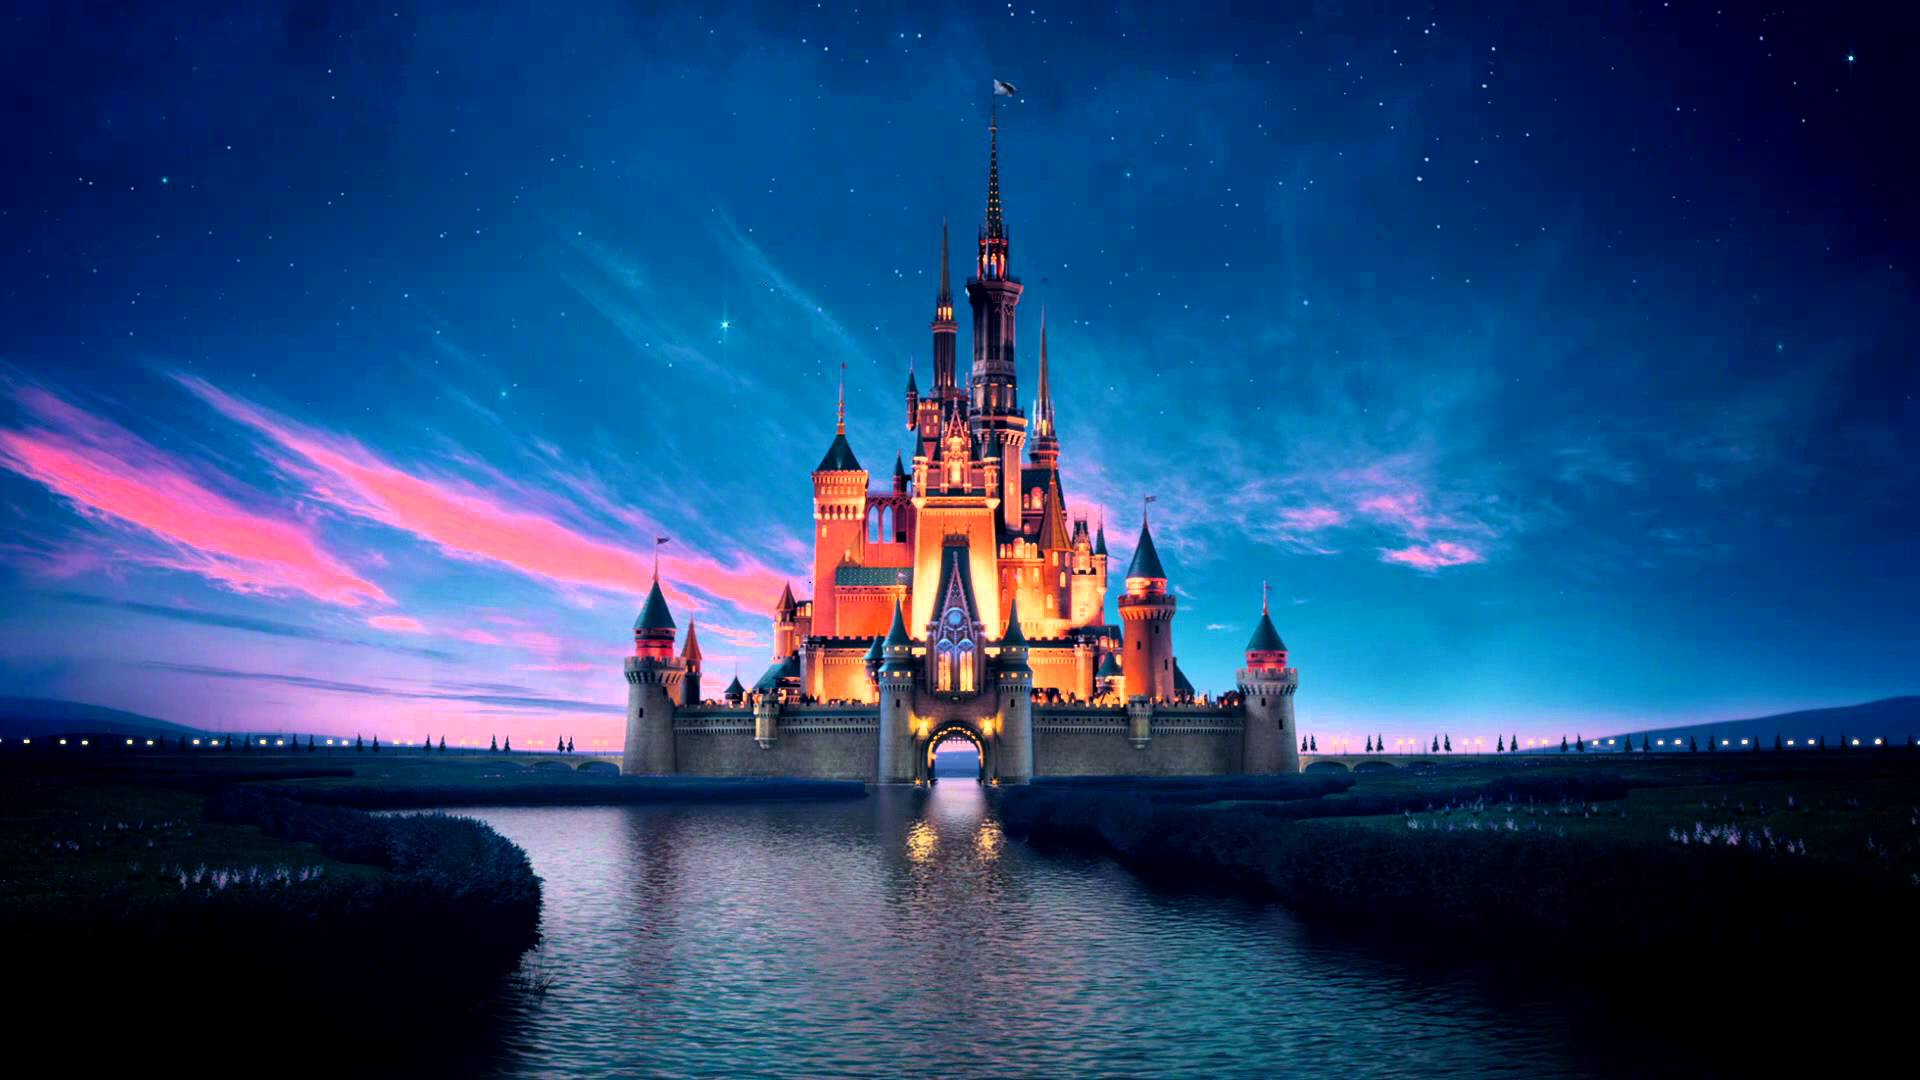 Disney Wallpapers - Top Free Disney